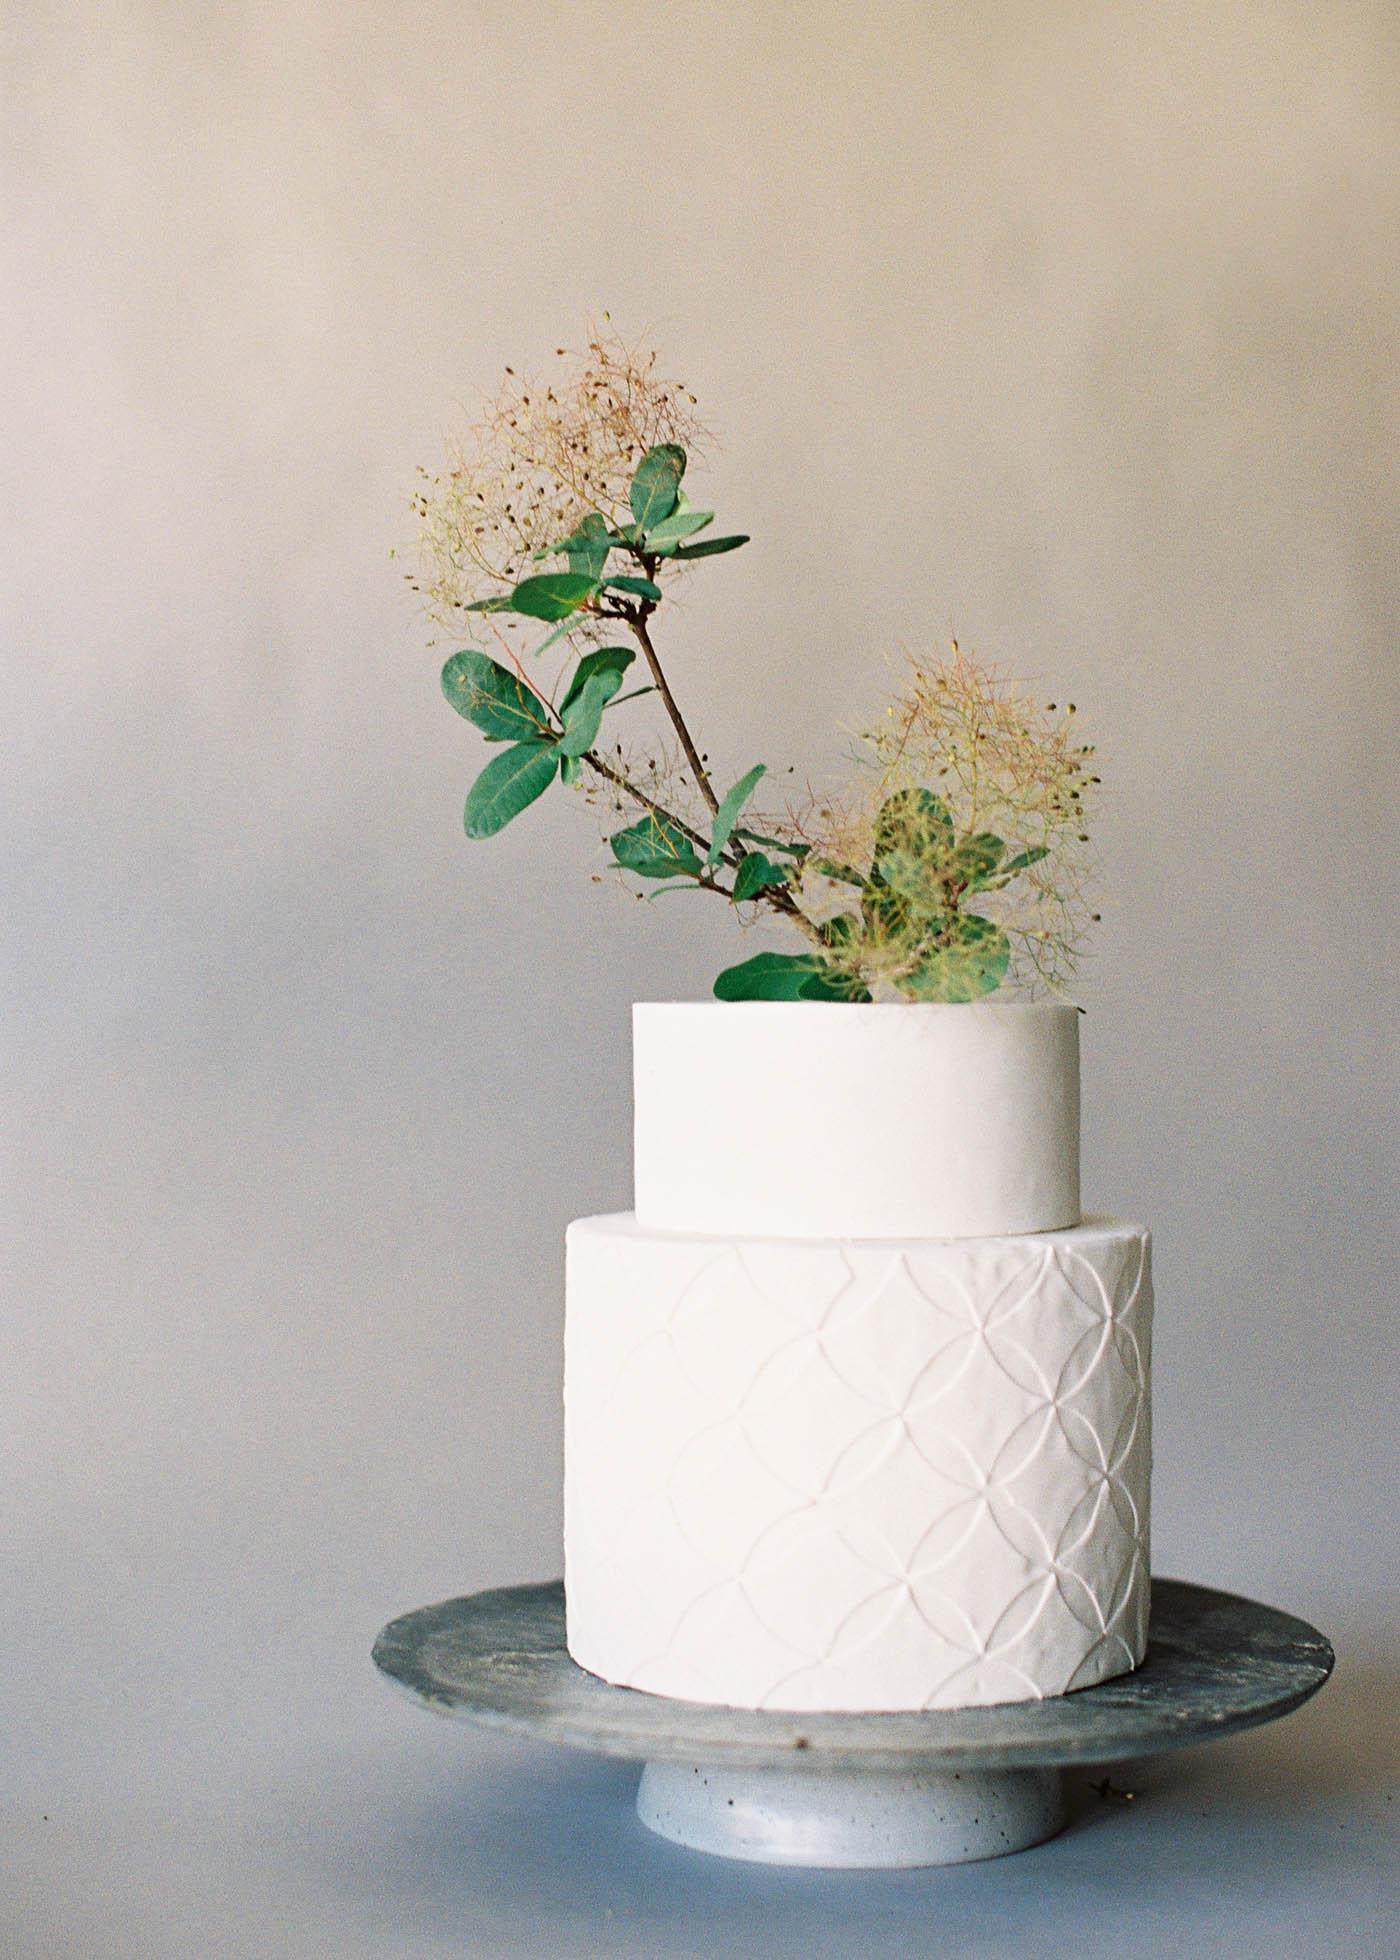 naturalist-cakes-11-Jen_Huang-000485-R1-023-10.jpg